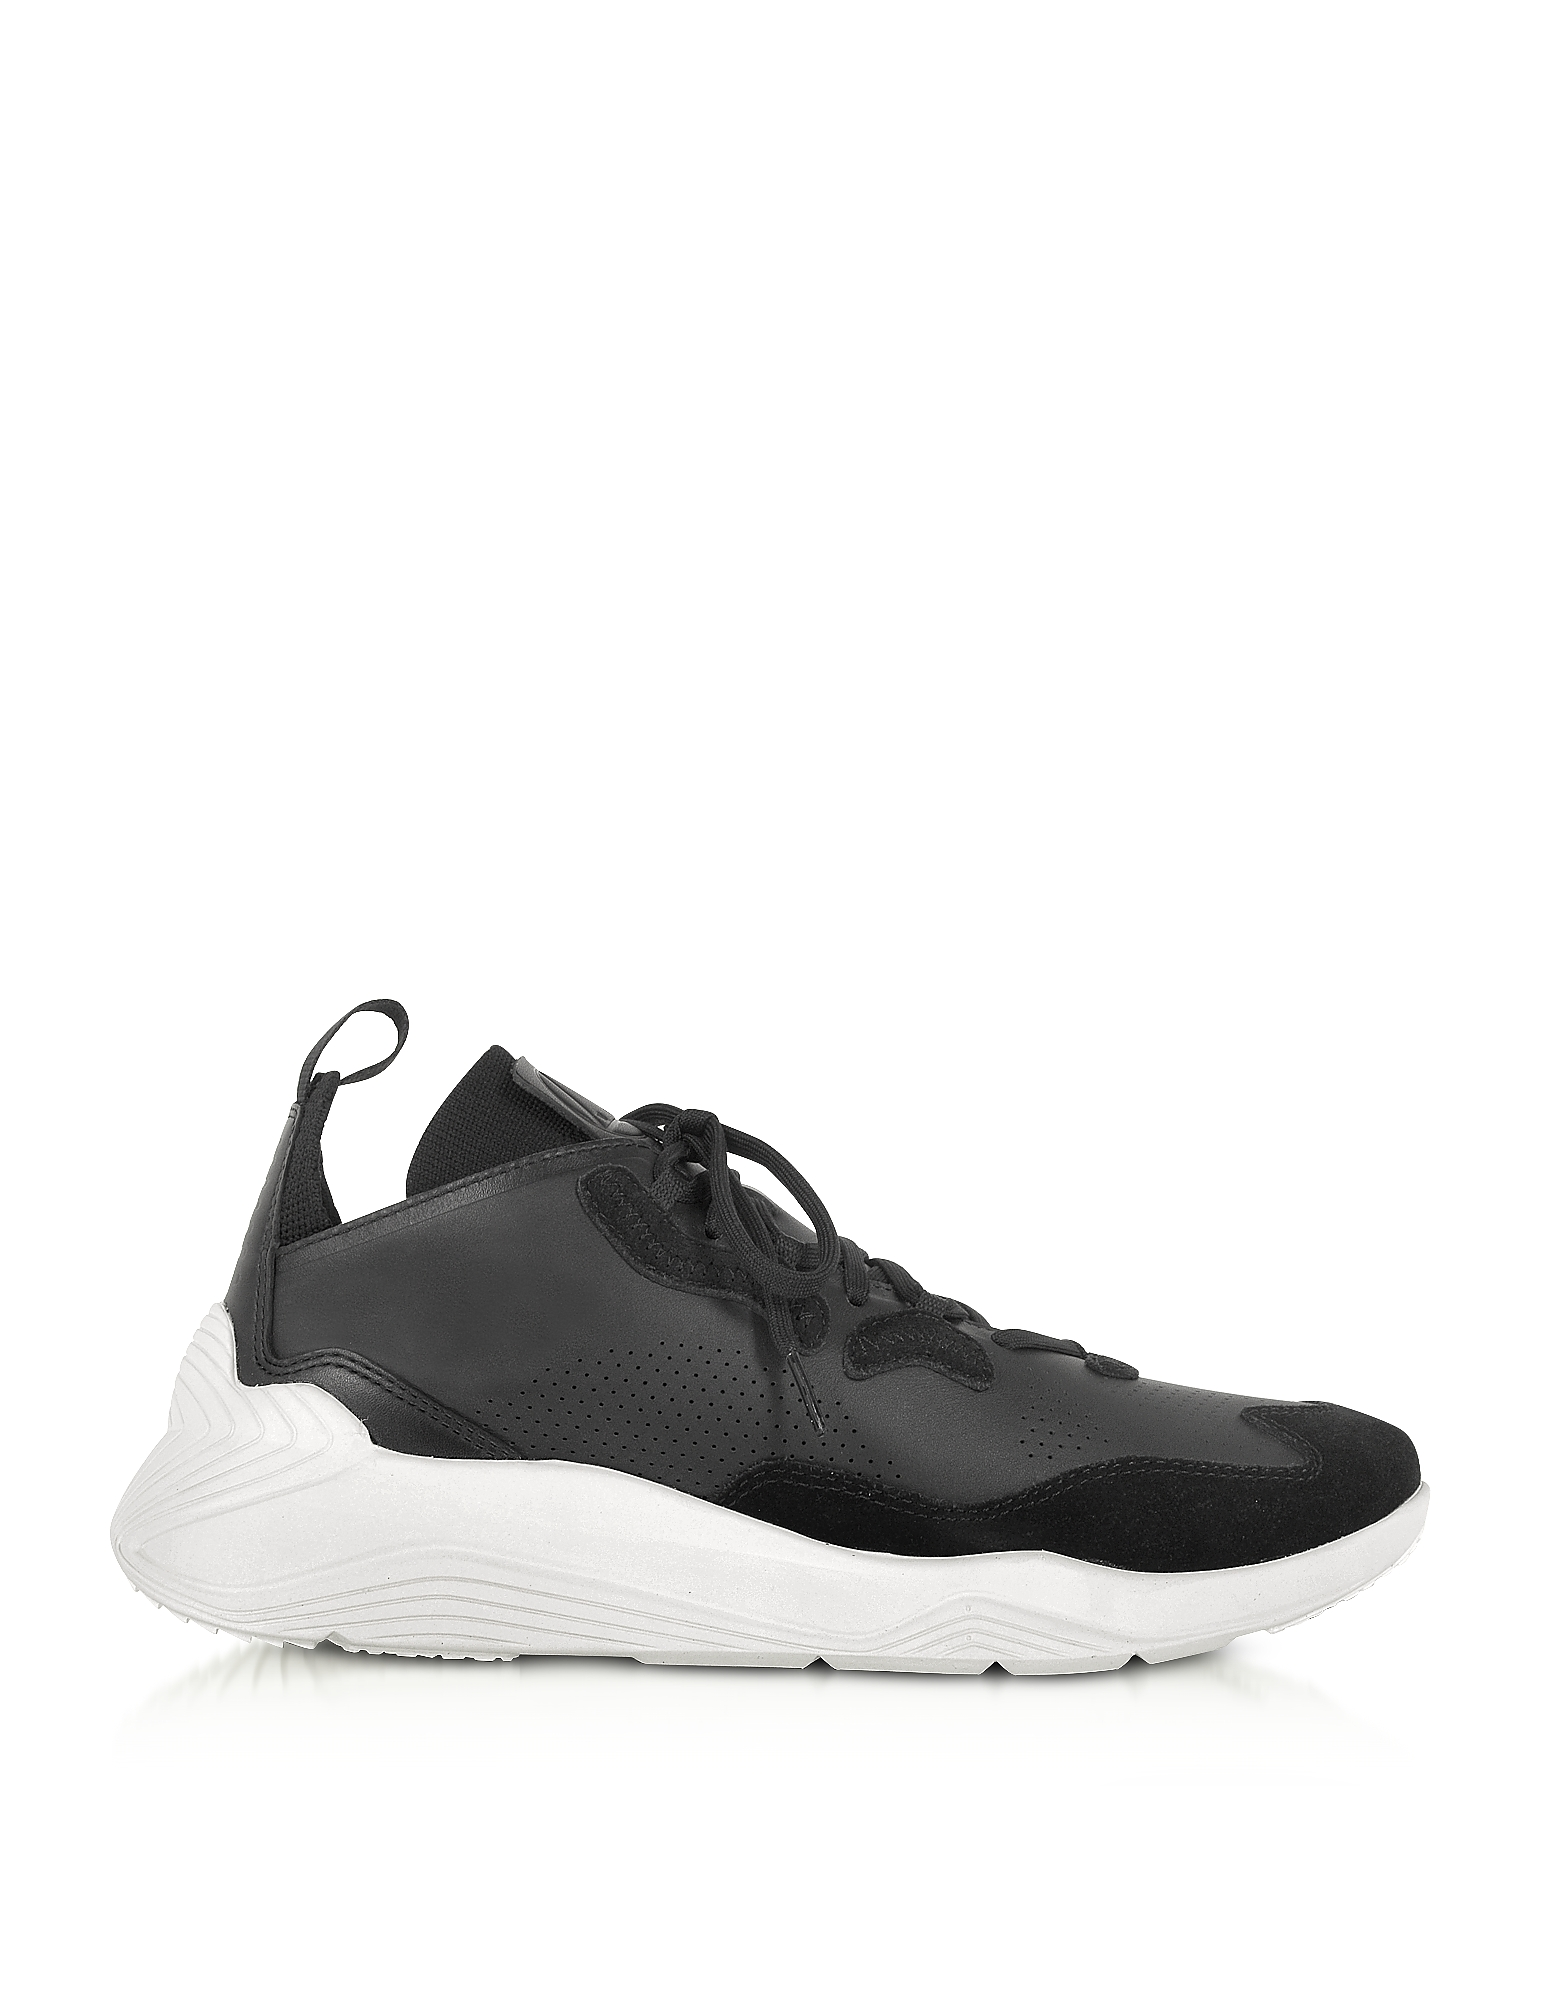 McQ Alexander McQueen Designer Shoes, Gishiki 3.0 Black Men's Sneakers